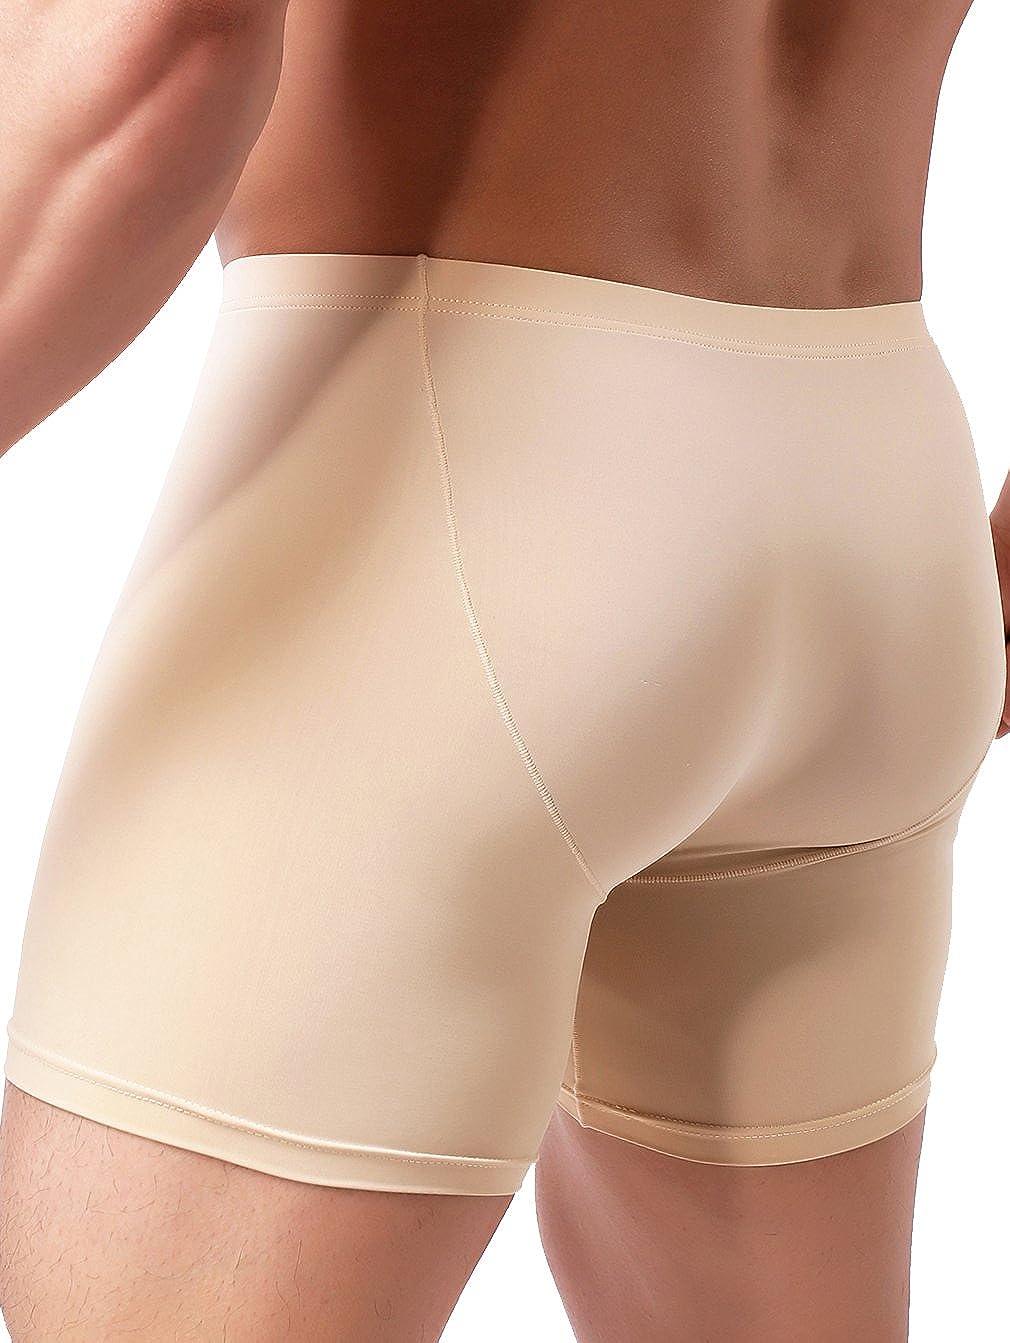 IKINGSKY Men's Long Leg Boxer Briefs Seamless Front Breathable Trunks Stretch Men Undepanties